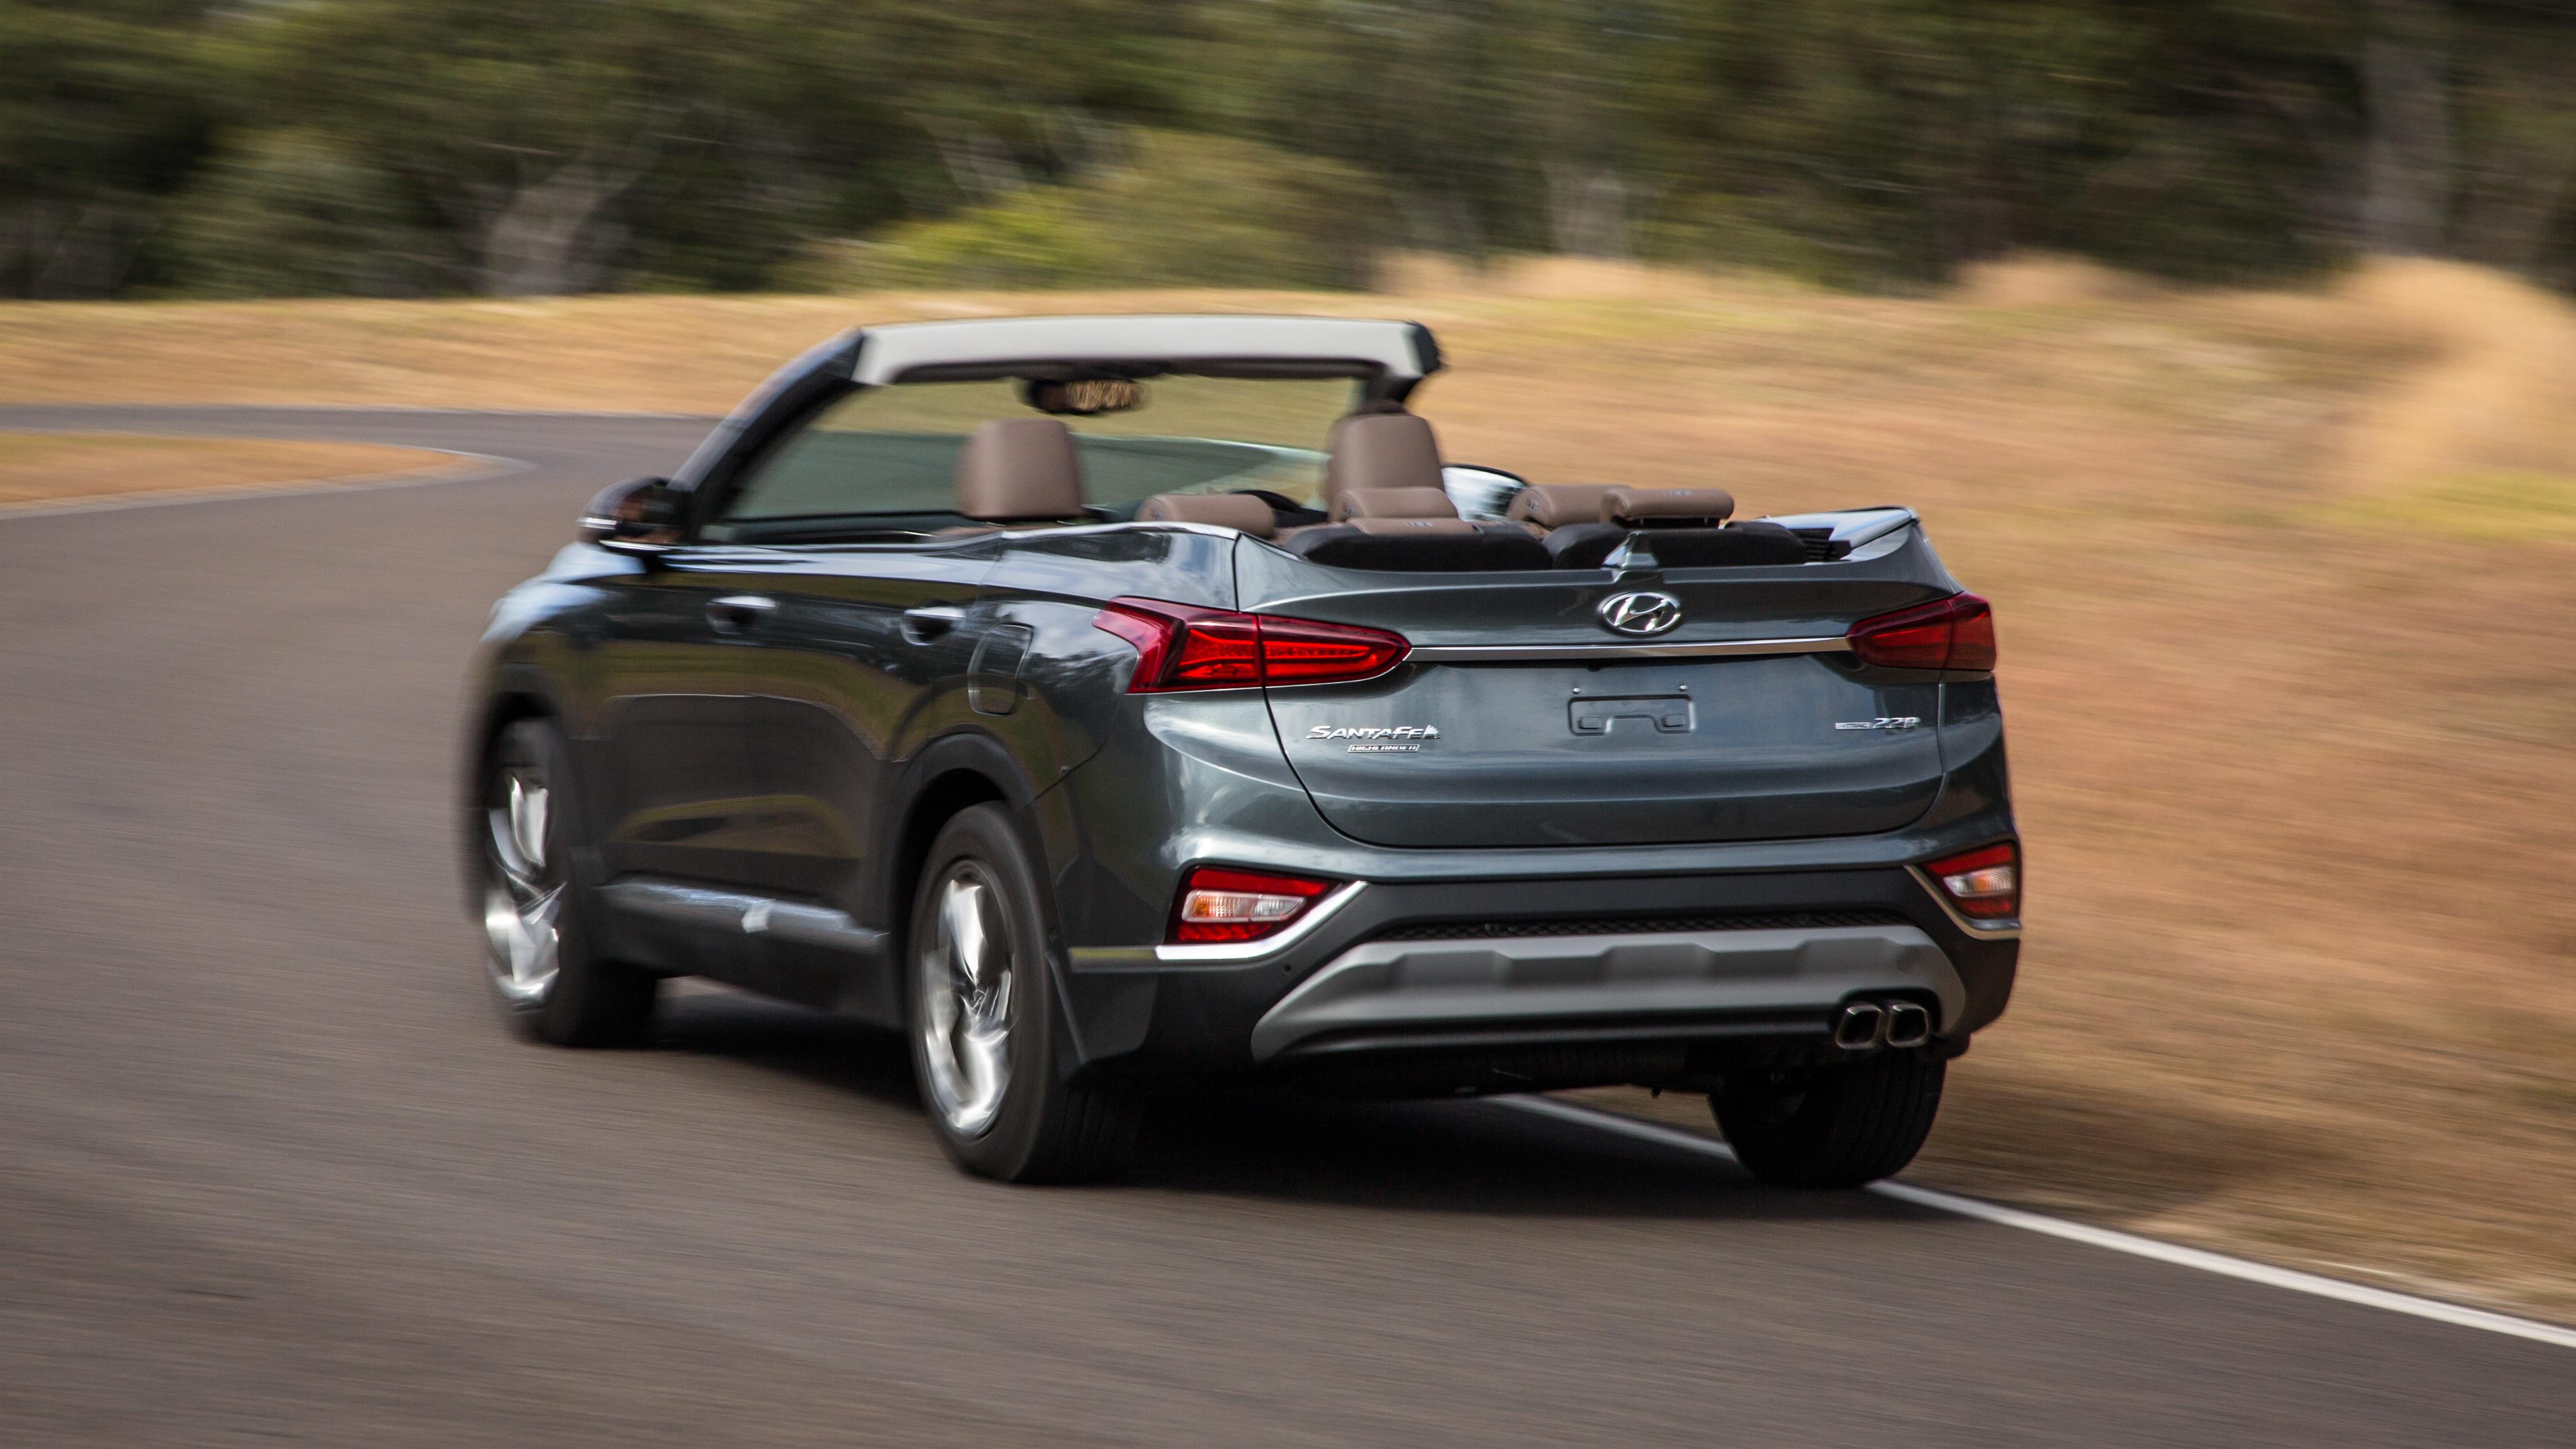 2019 Hyundai Santa Fe Cabriolet Prototype Spotted Down ...